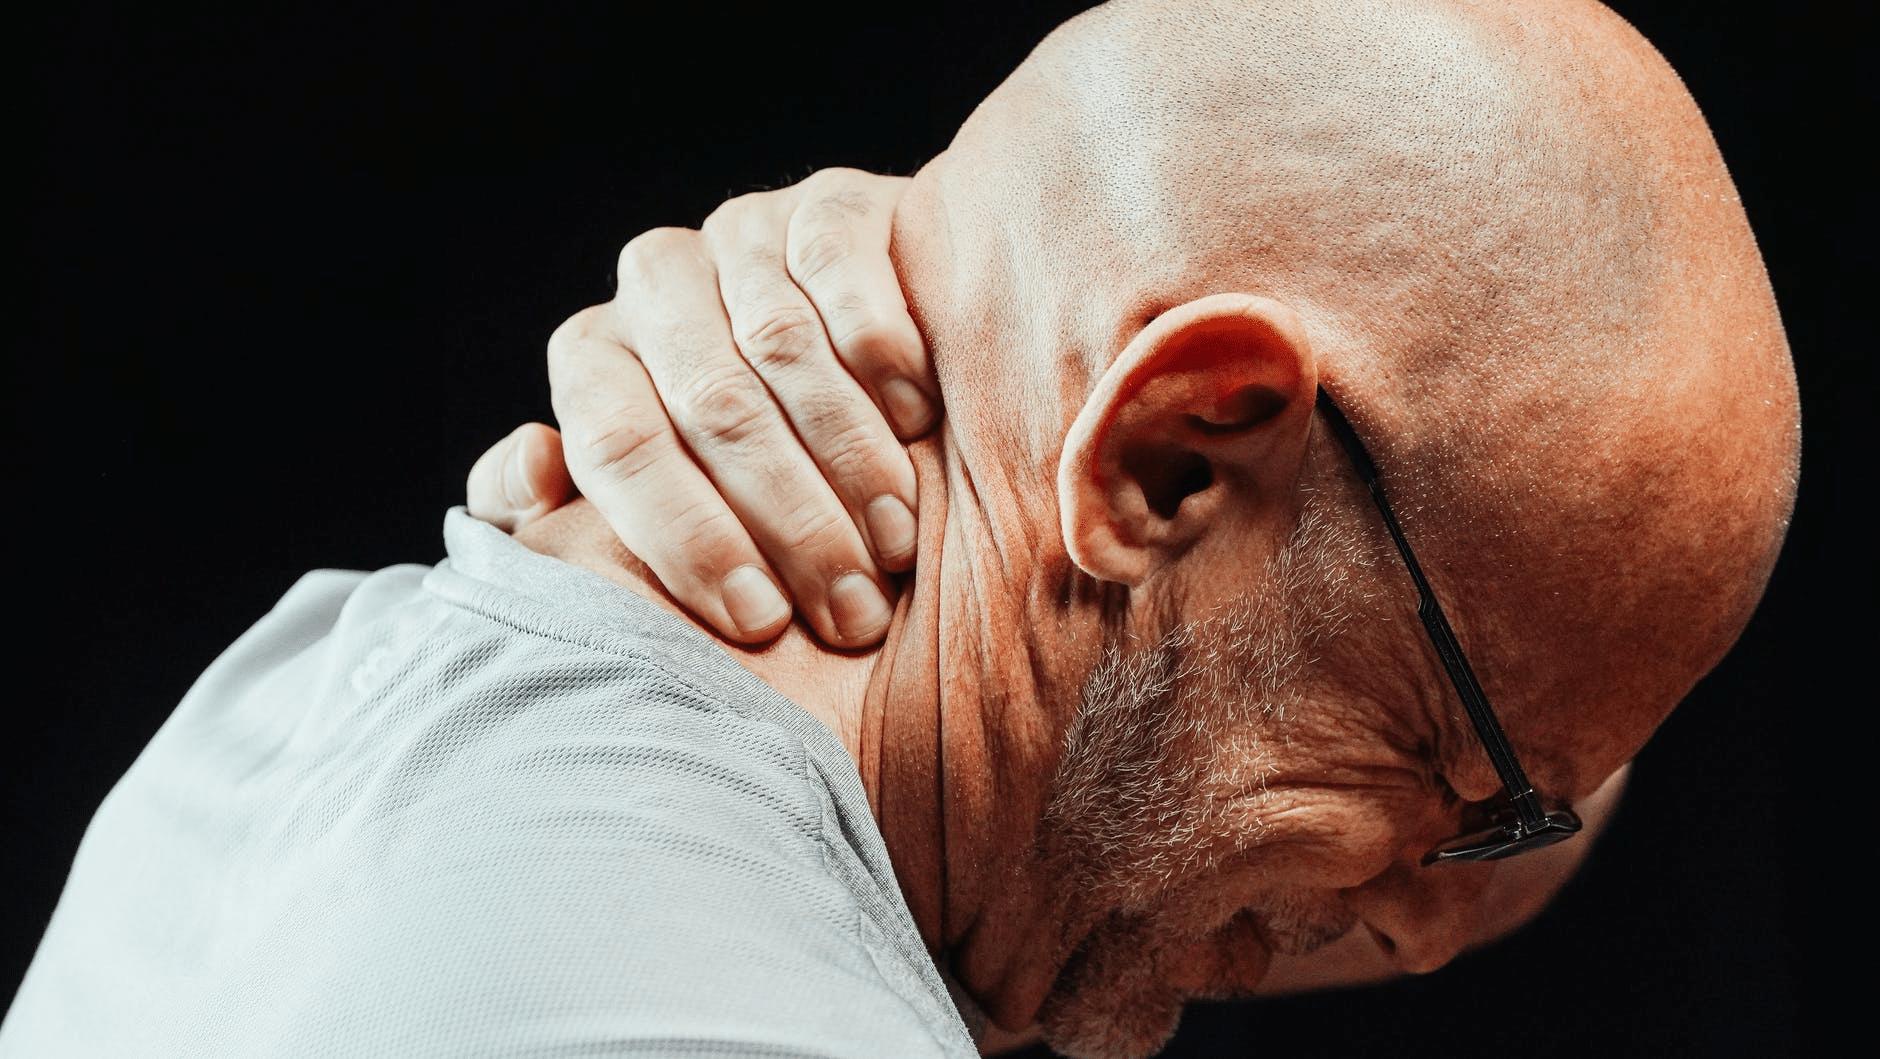 Man holding his neck